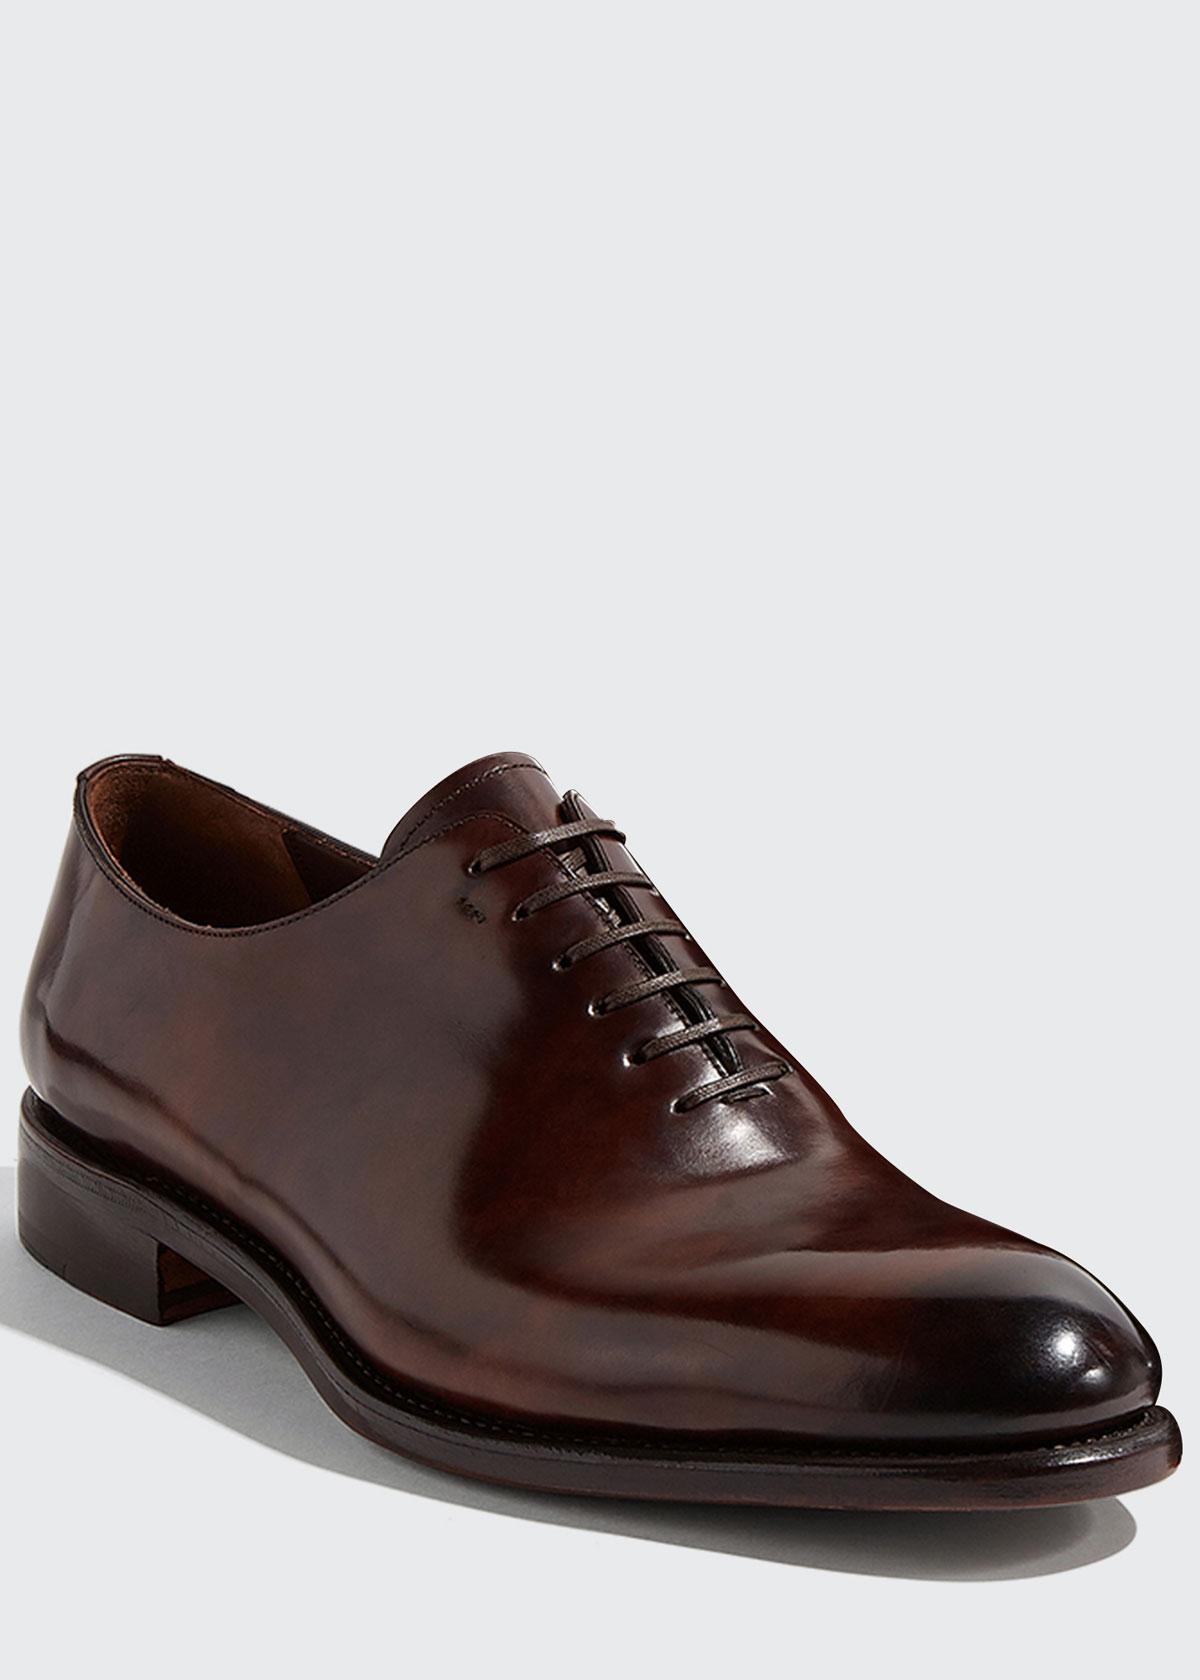 Salvatore Ferragamo Men's Angiolo Tramezza Whole-Cut Leather Lace-Up Shoes  - AFRICA - Size: 11EE